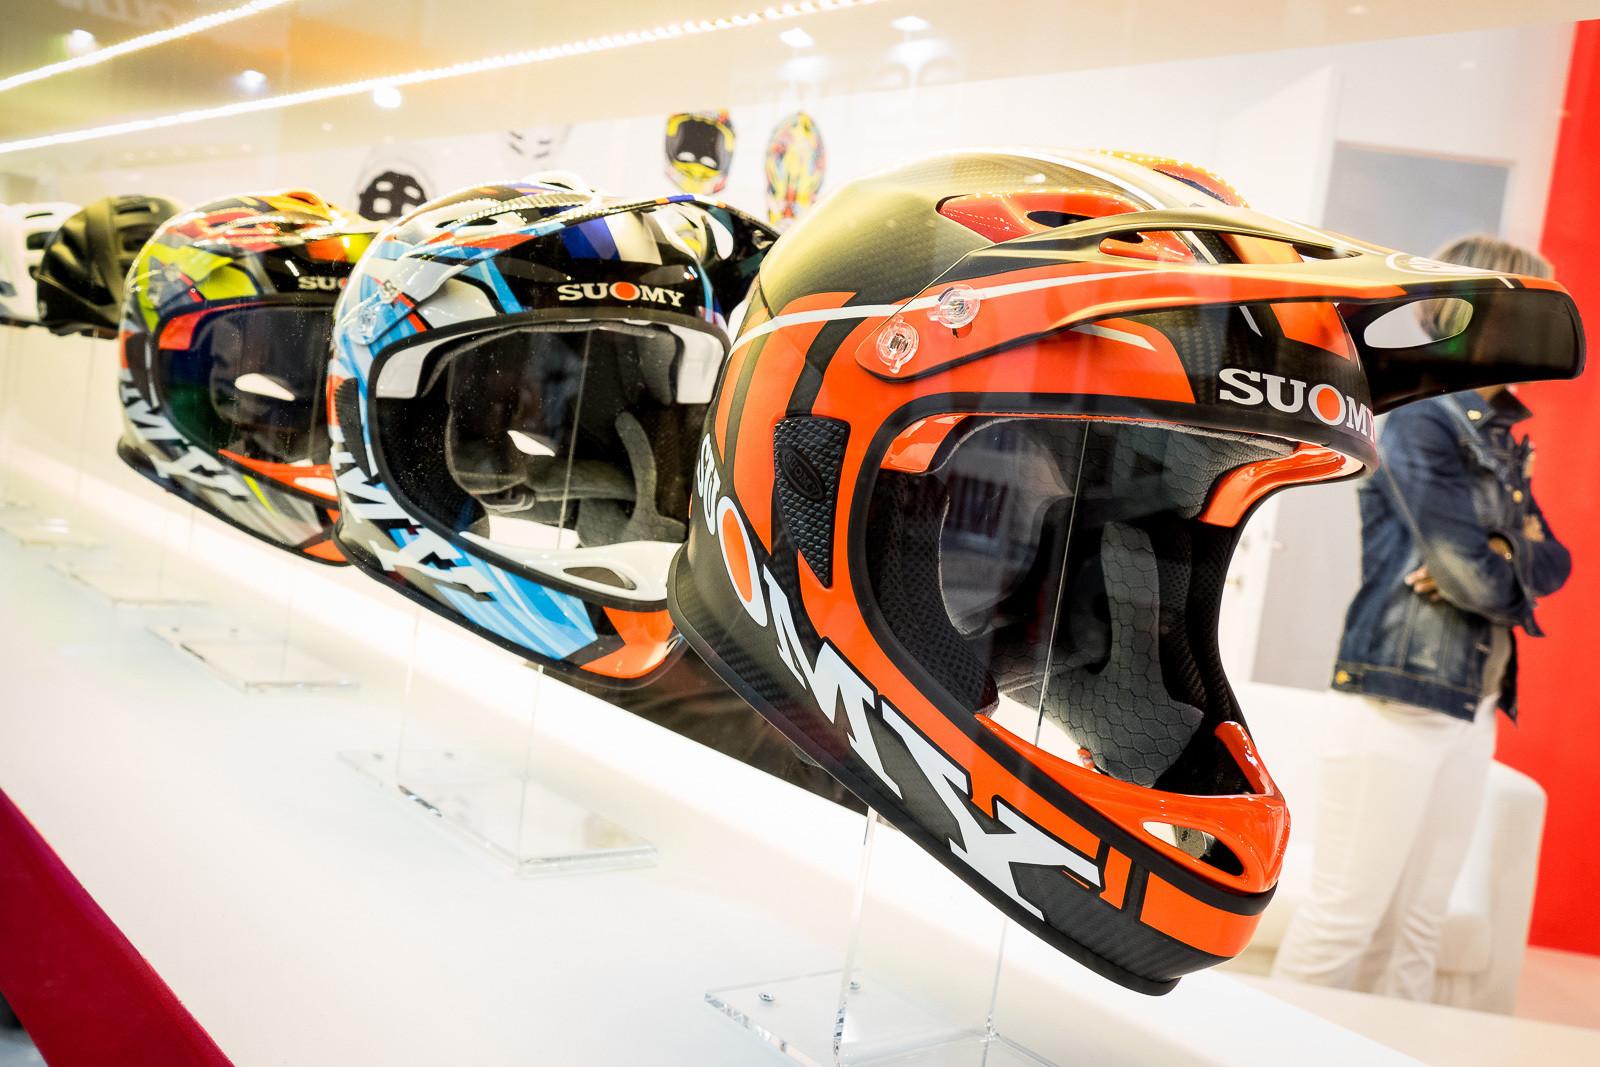 Suomy Helmets - 2016 Mountain Bike Apparel & Protection at Eurobike - Mountain Biking Pictures - Vital MTB